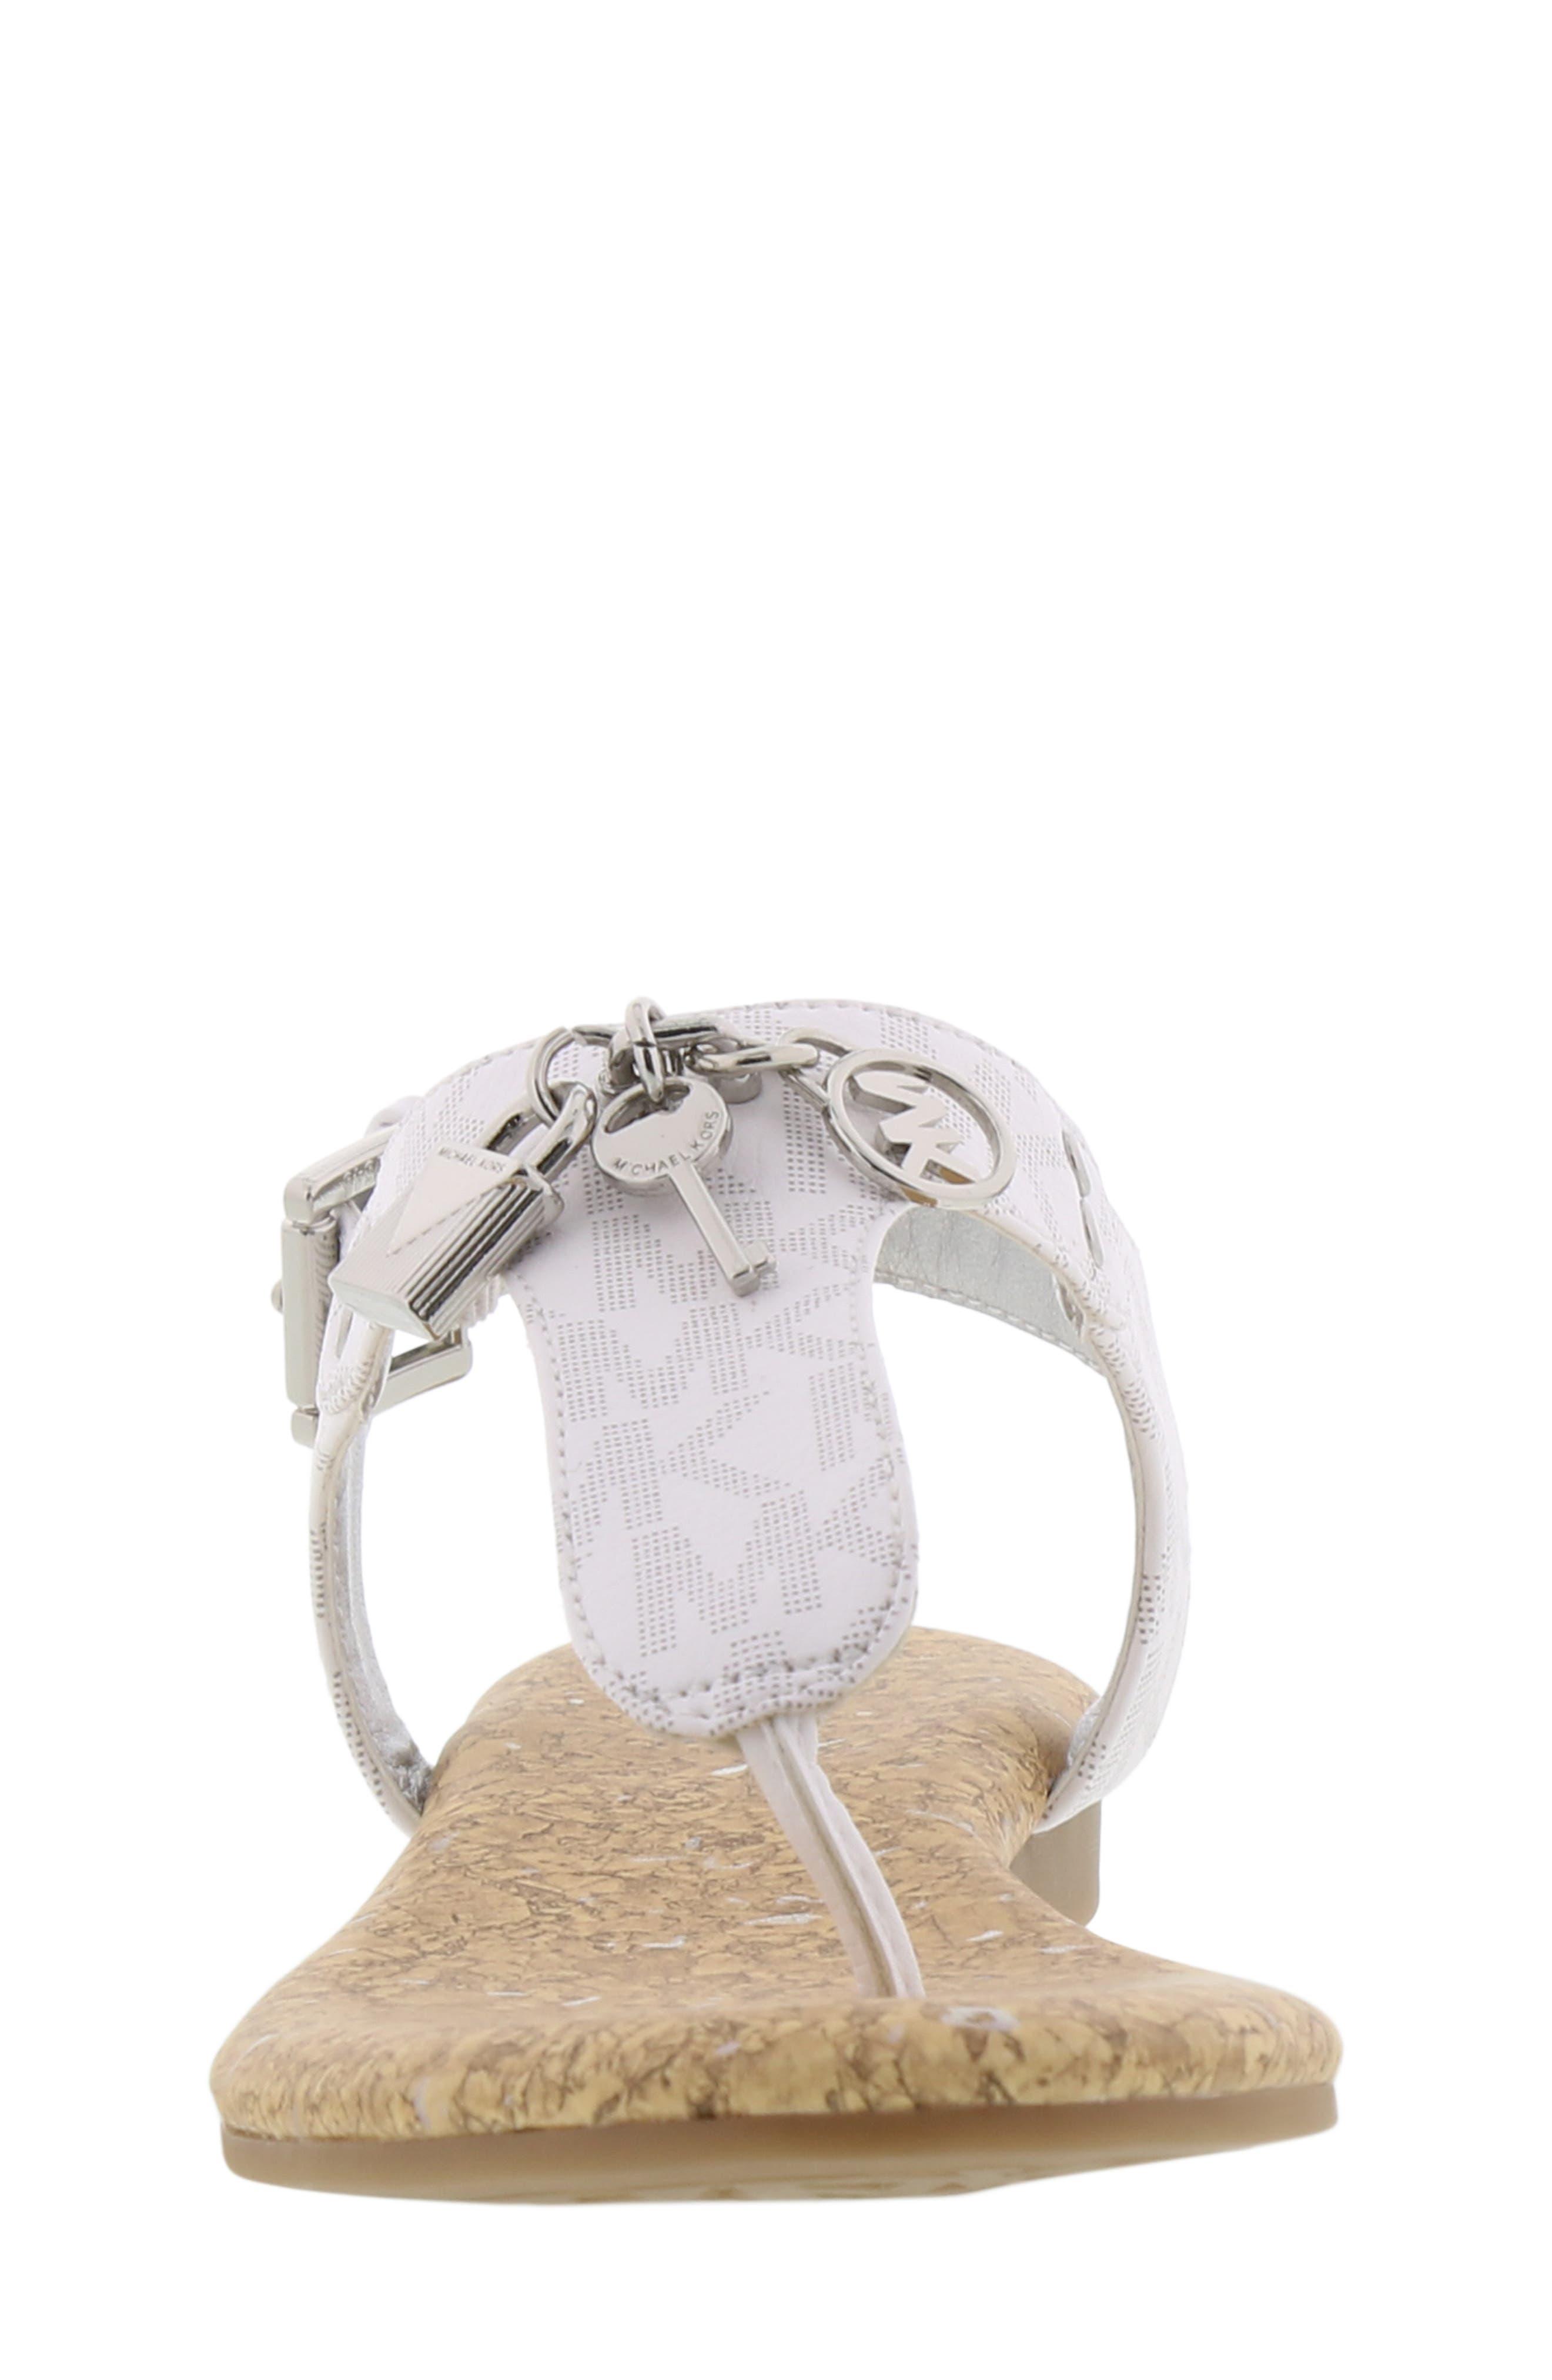 MICHAEL MICHAEL KORS, Tilly Cora Charm T-Strap Sandal, Alternate thumbnail 4, color, WHITE LOGO